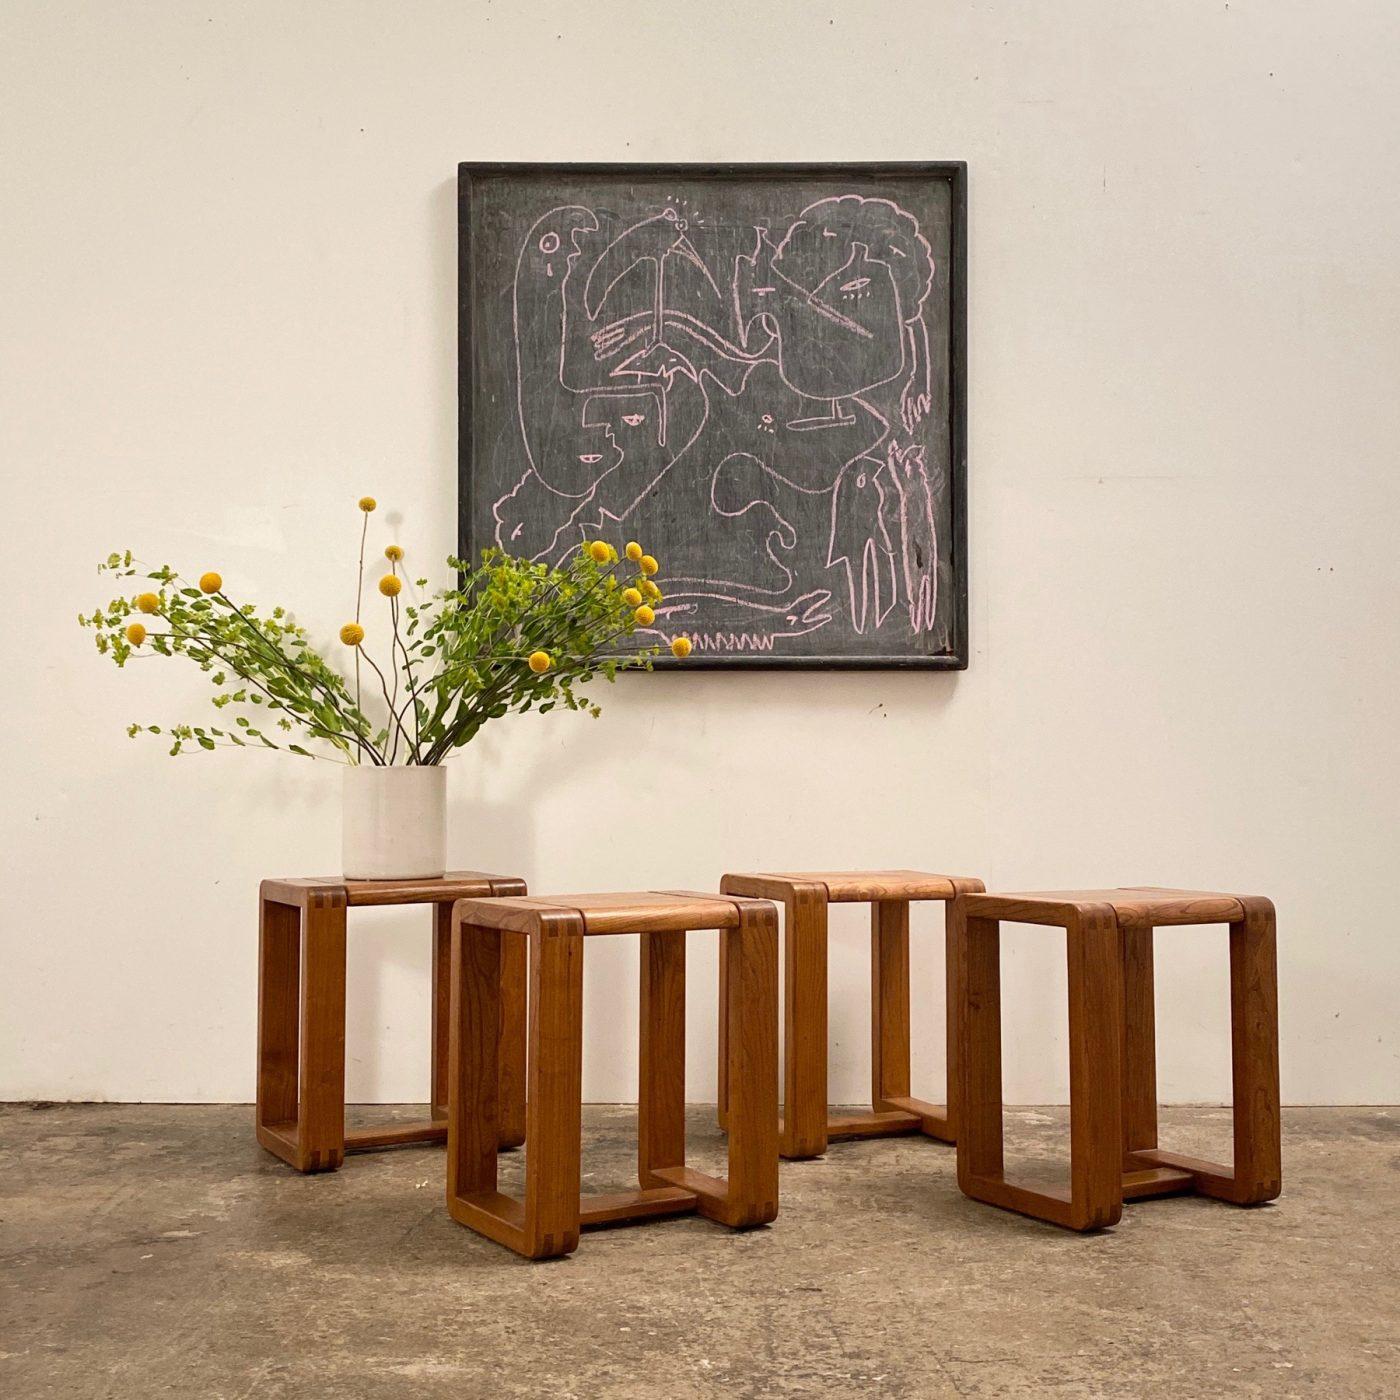 objet-vagabond-massive-stools0005